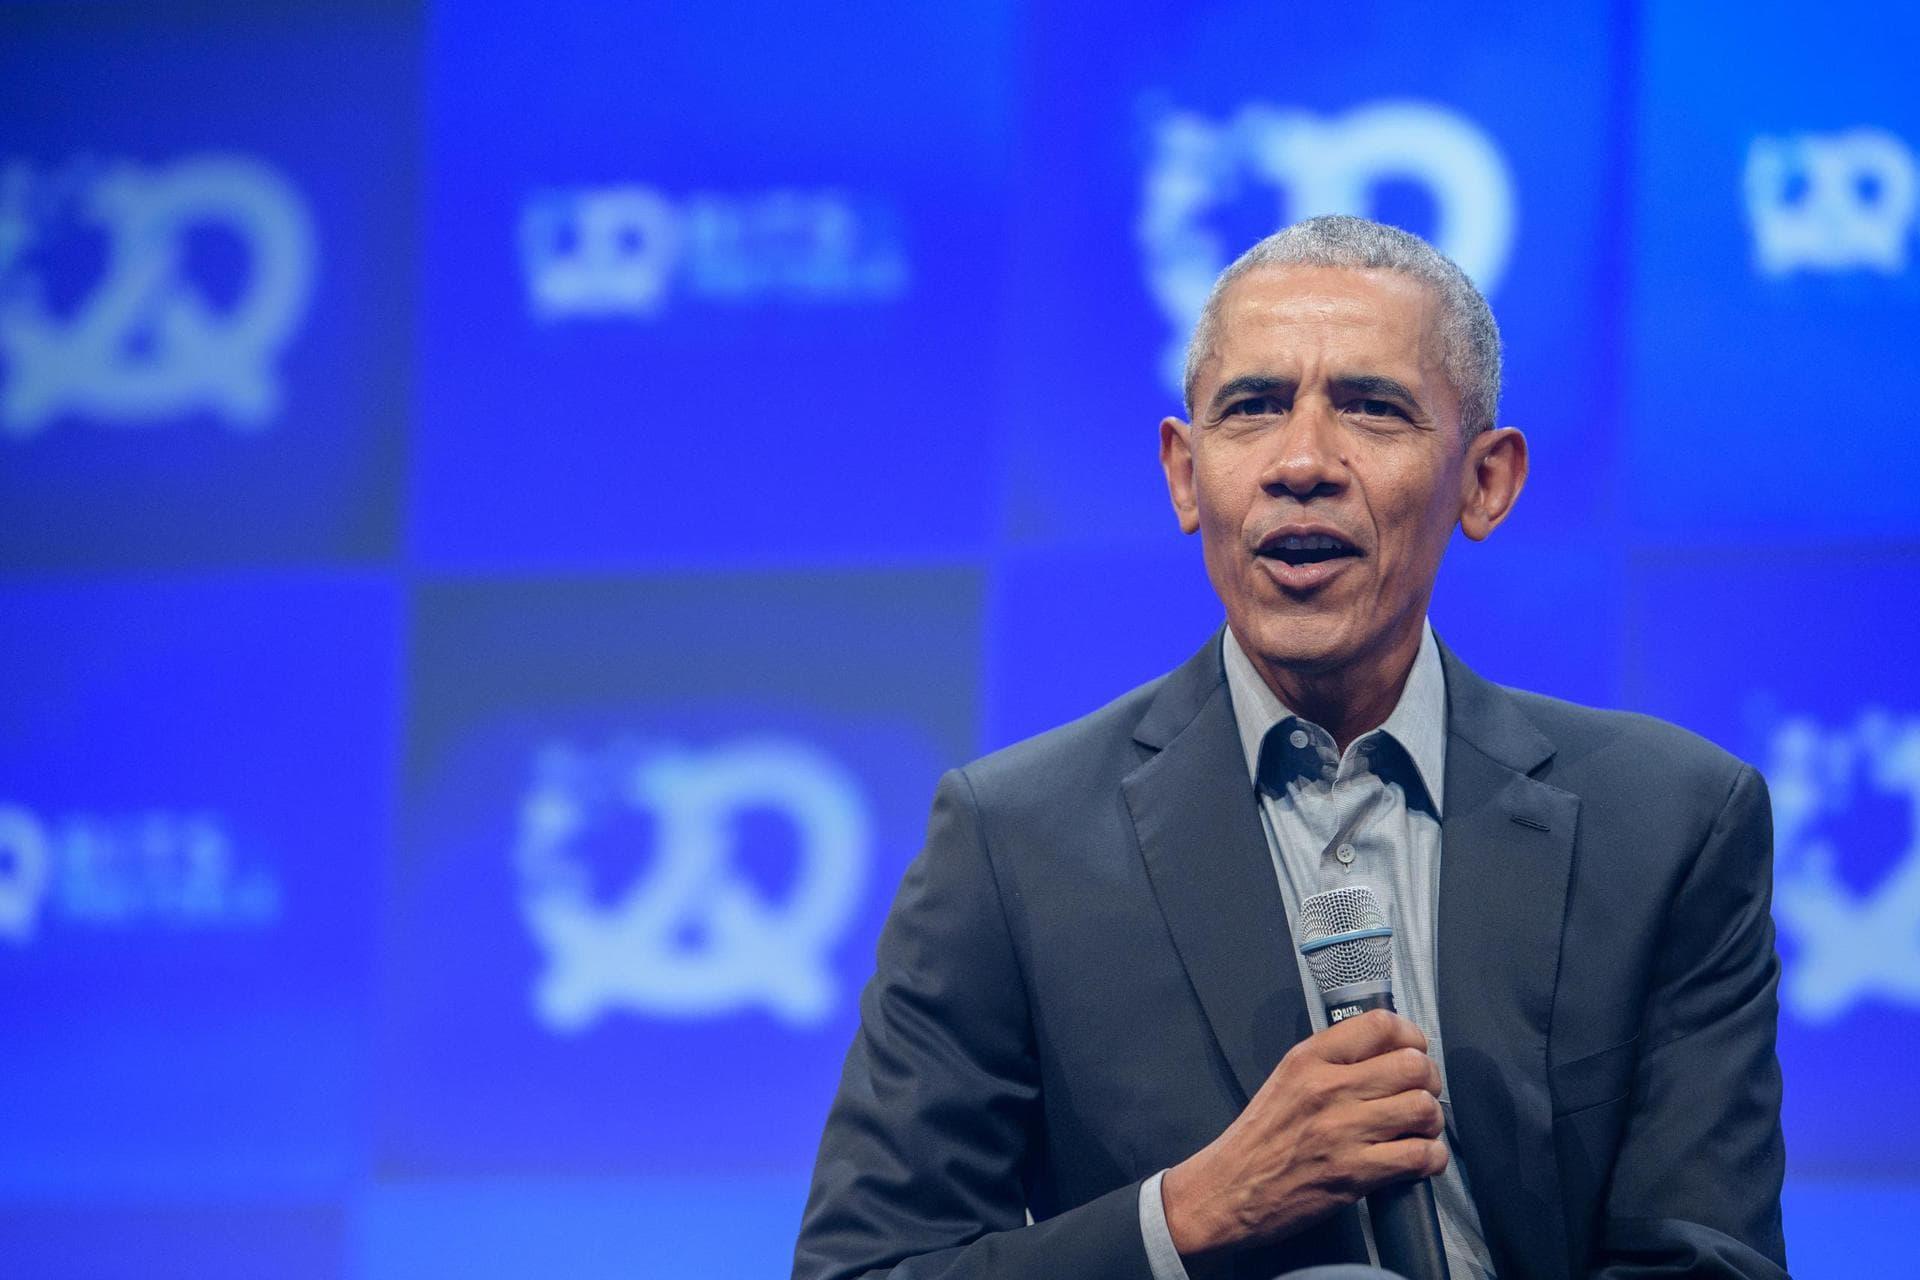 Barack Obama mag die TV-Serie «Better Call Saul» Bestsellerautor